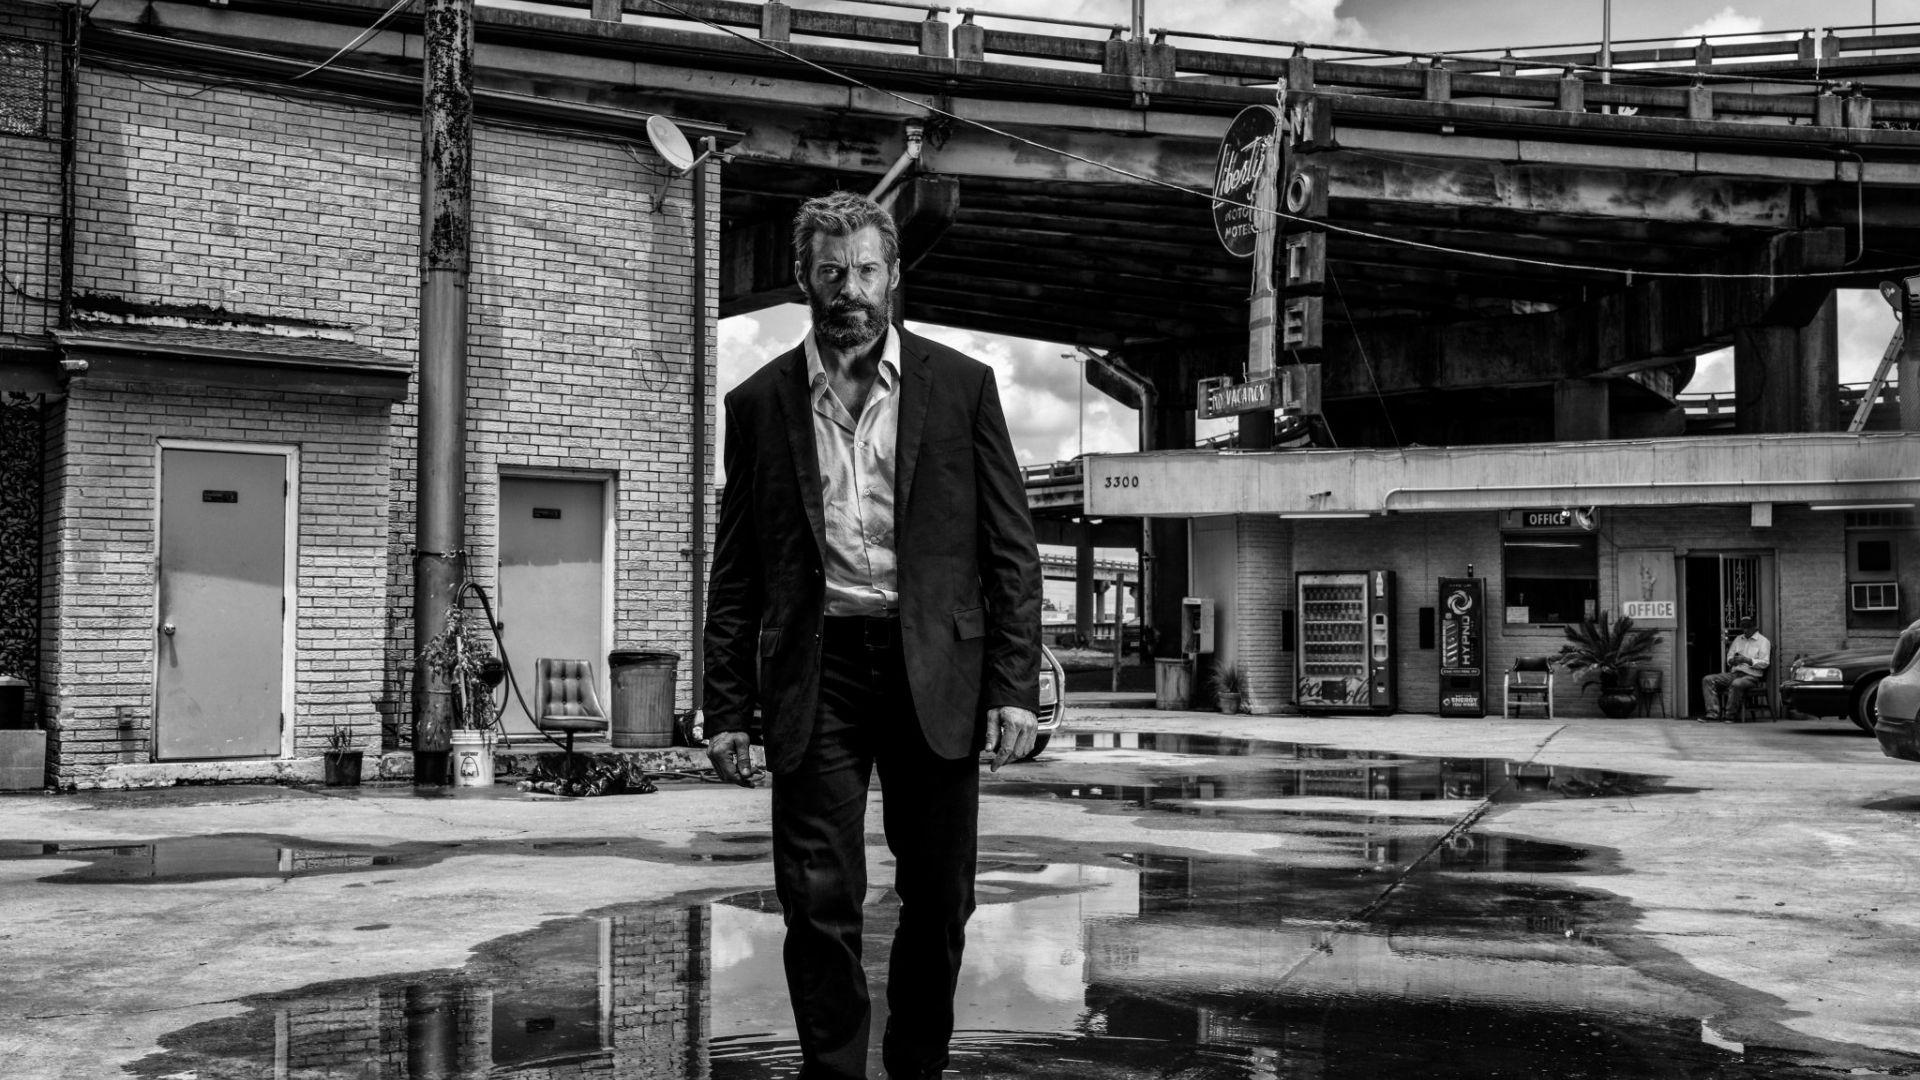 Wallpaper Logan 2017 hugh jackman in suit